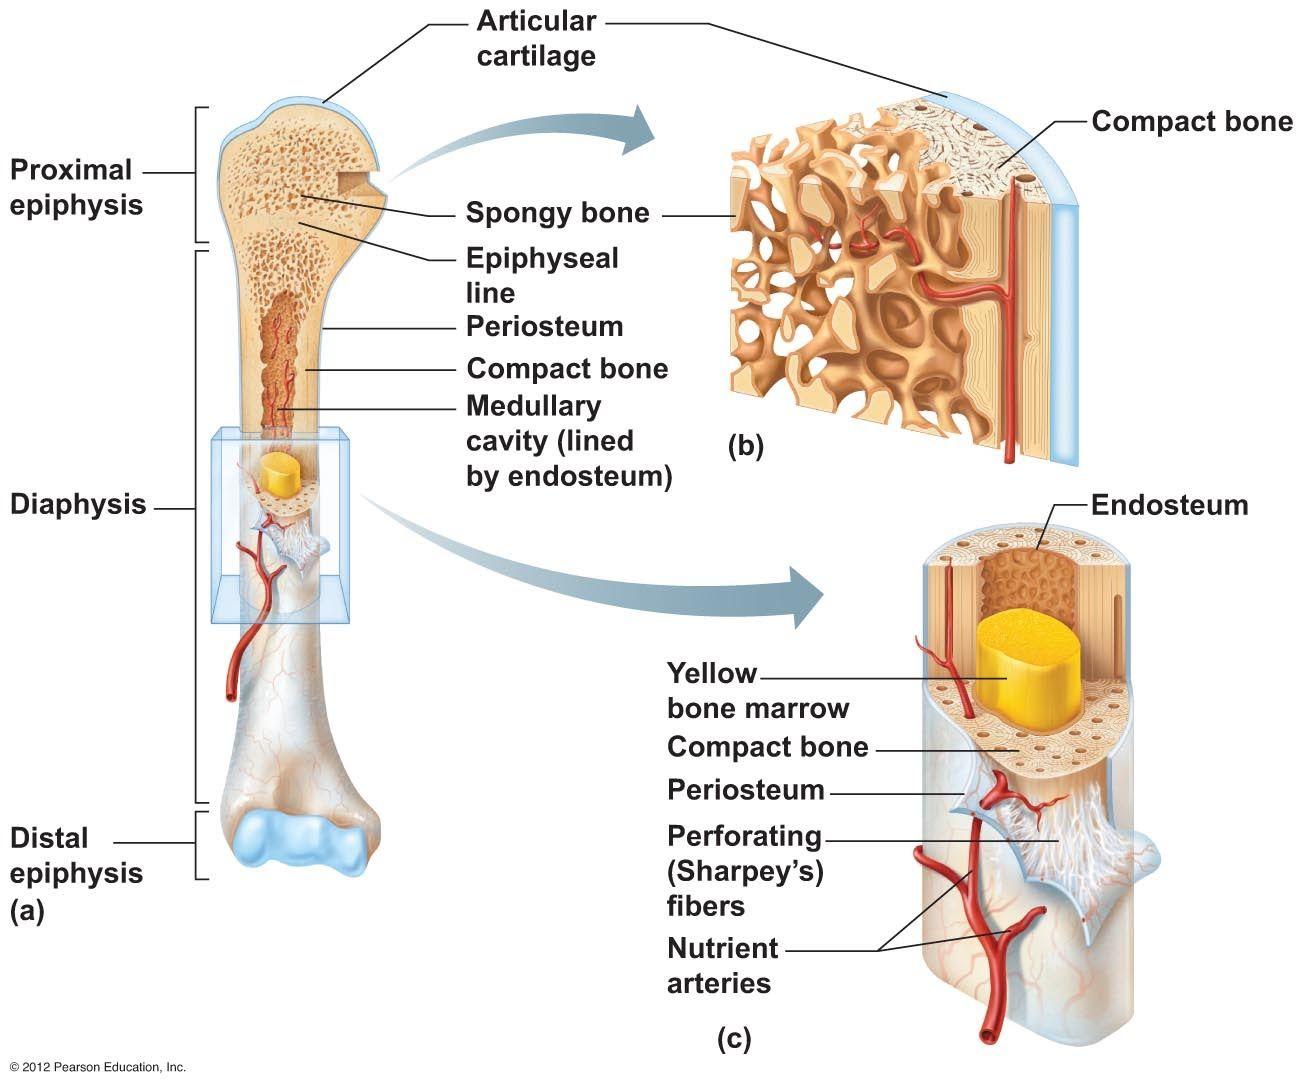 Pin by Neil Motbey on Regional Anatomy & Physiology   Pinterest ...